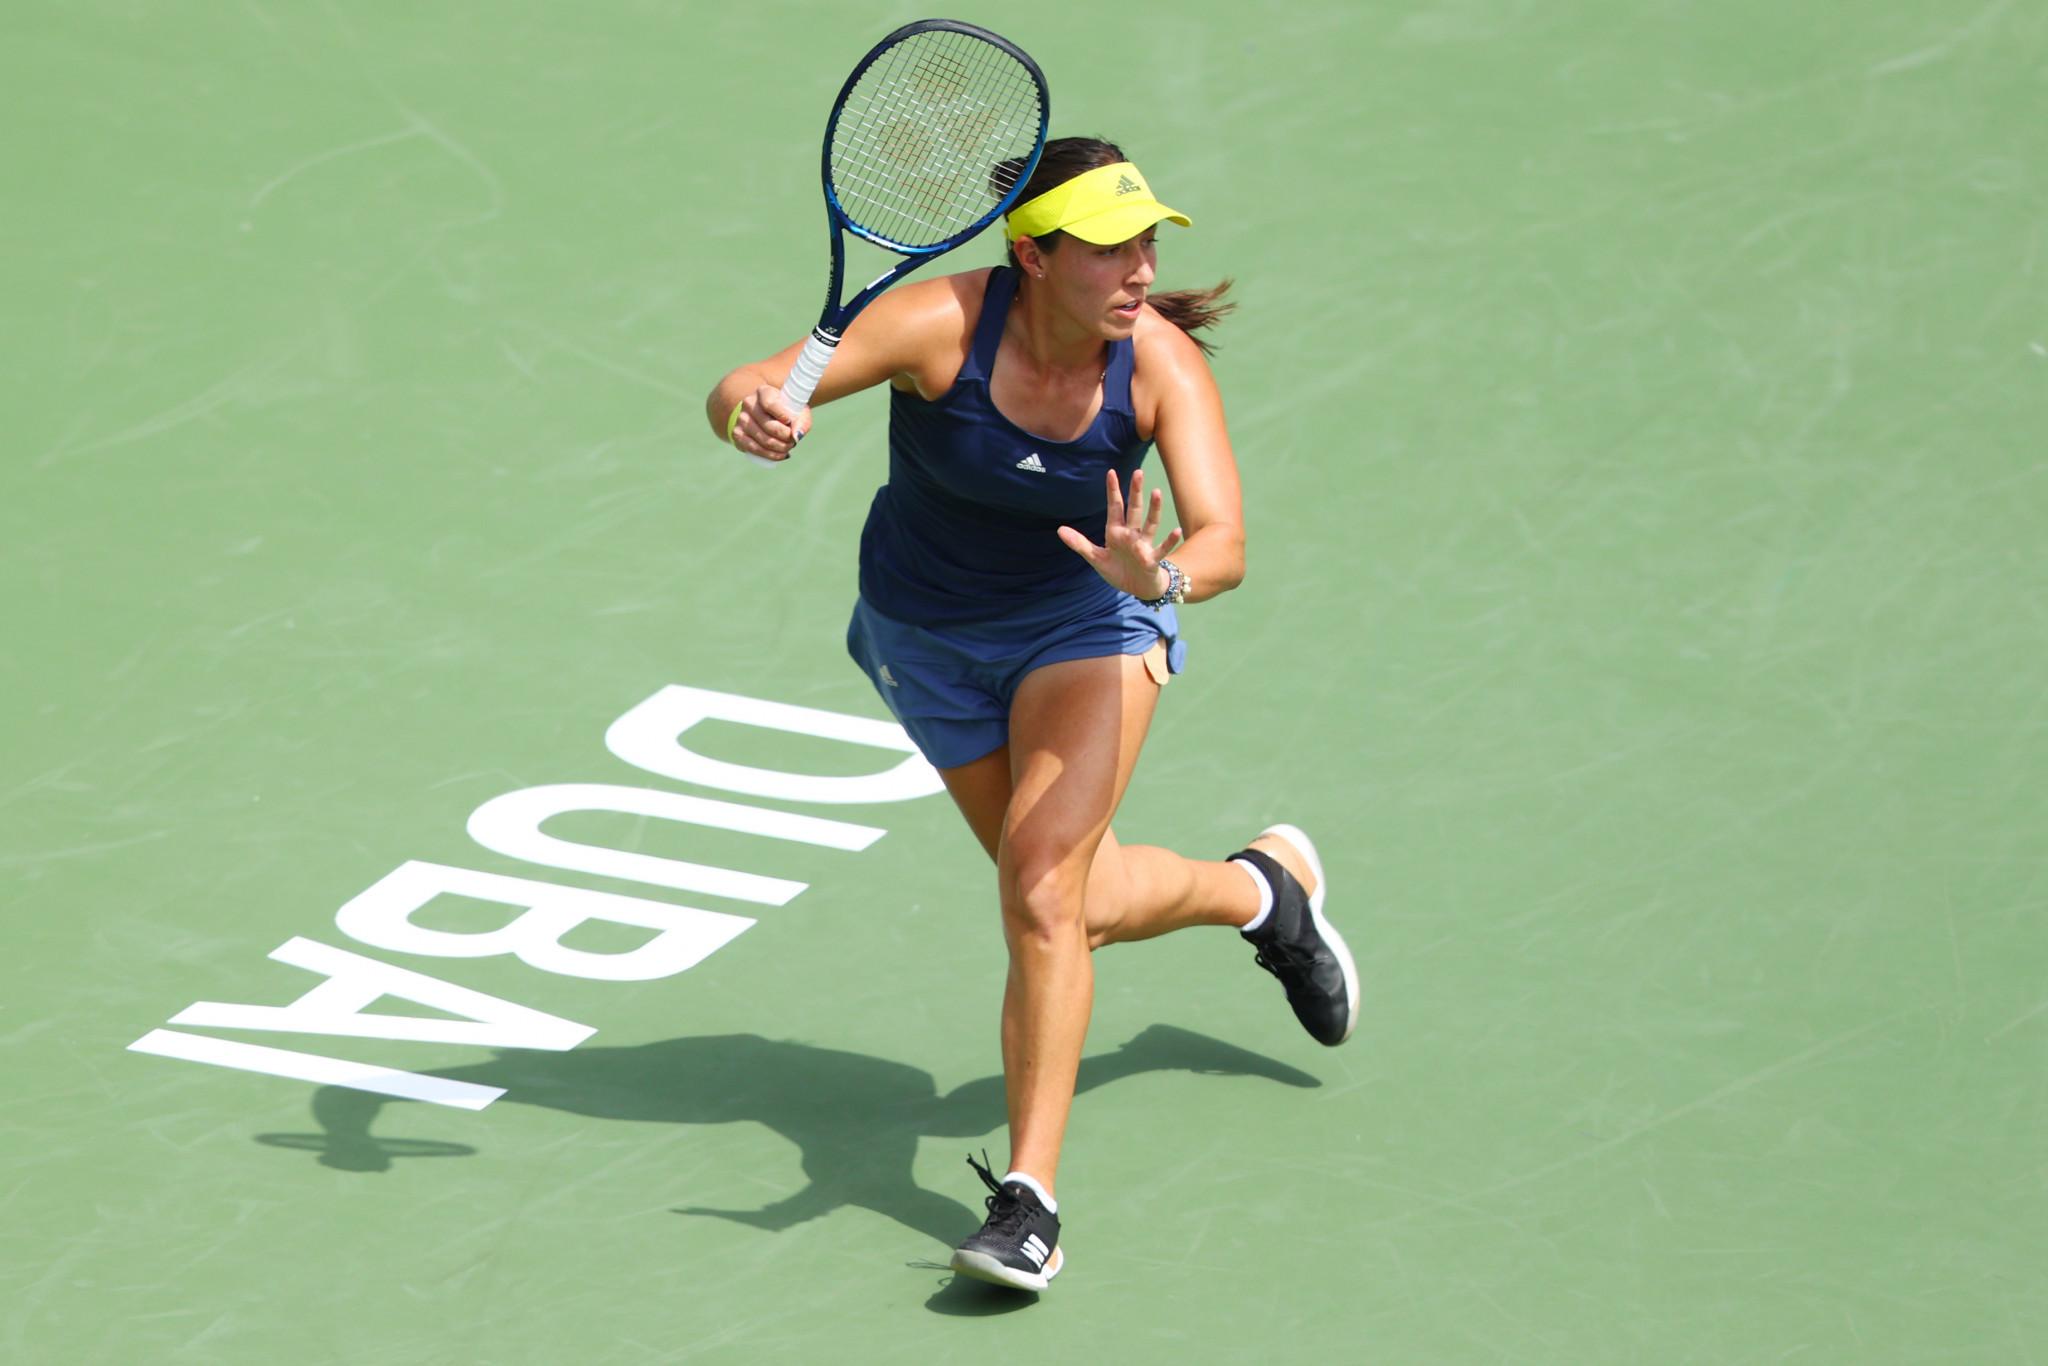 World number 36 Pegula dumps second seed Pliskova out of WTA Dubai Tennis Championships